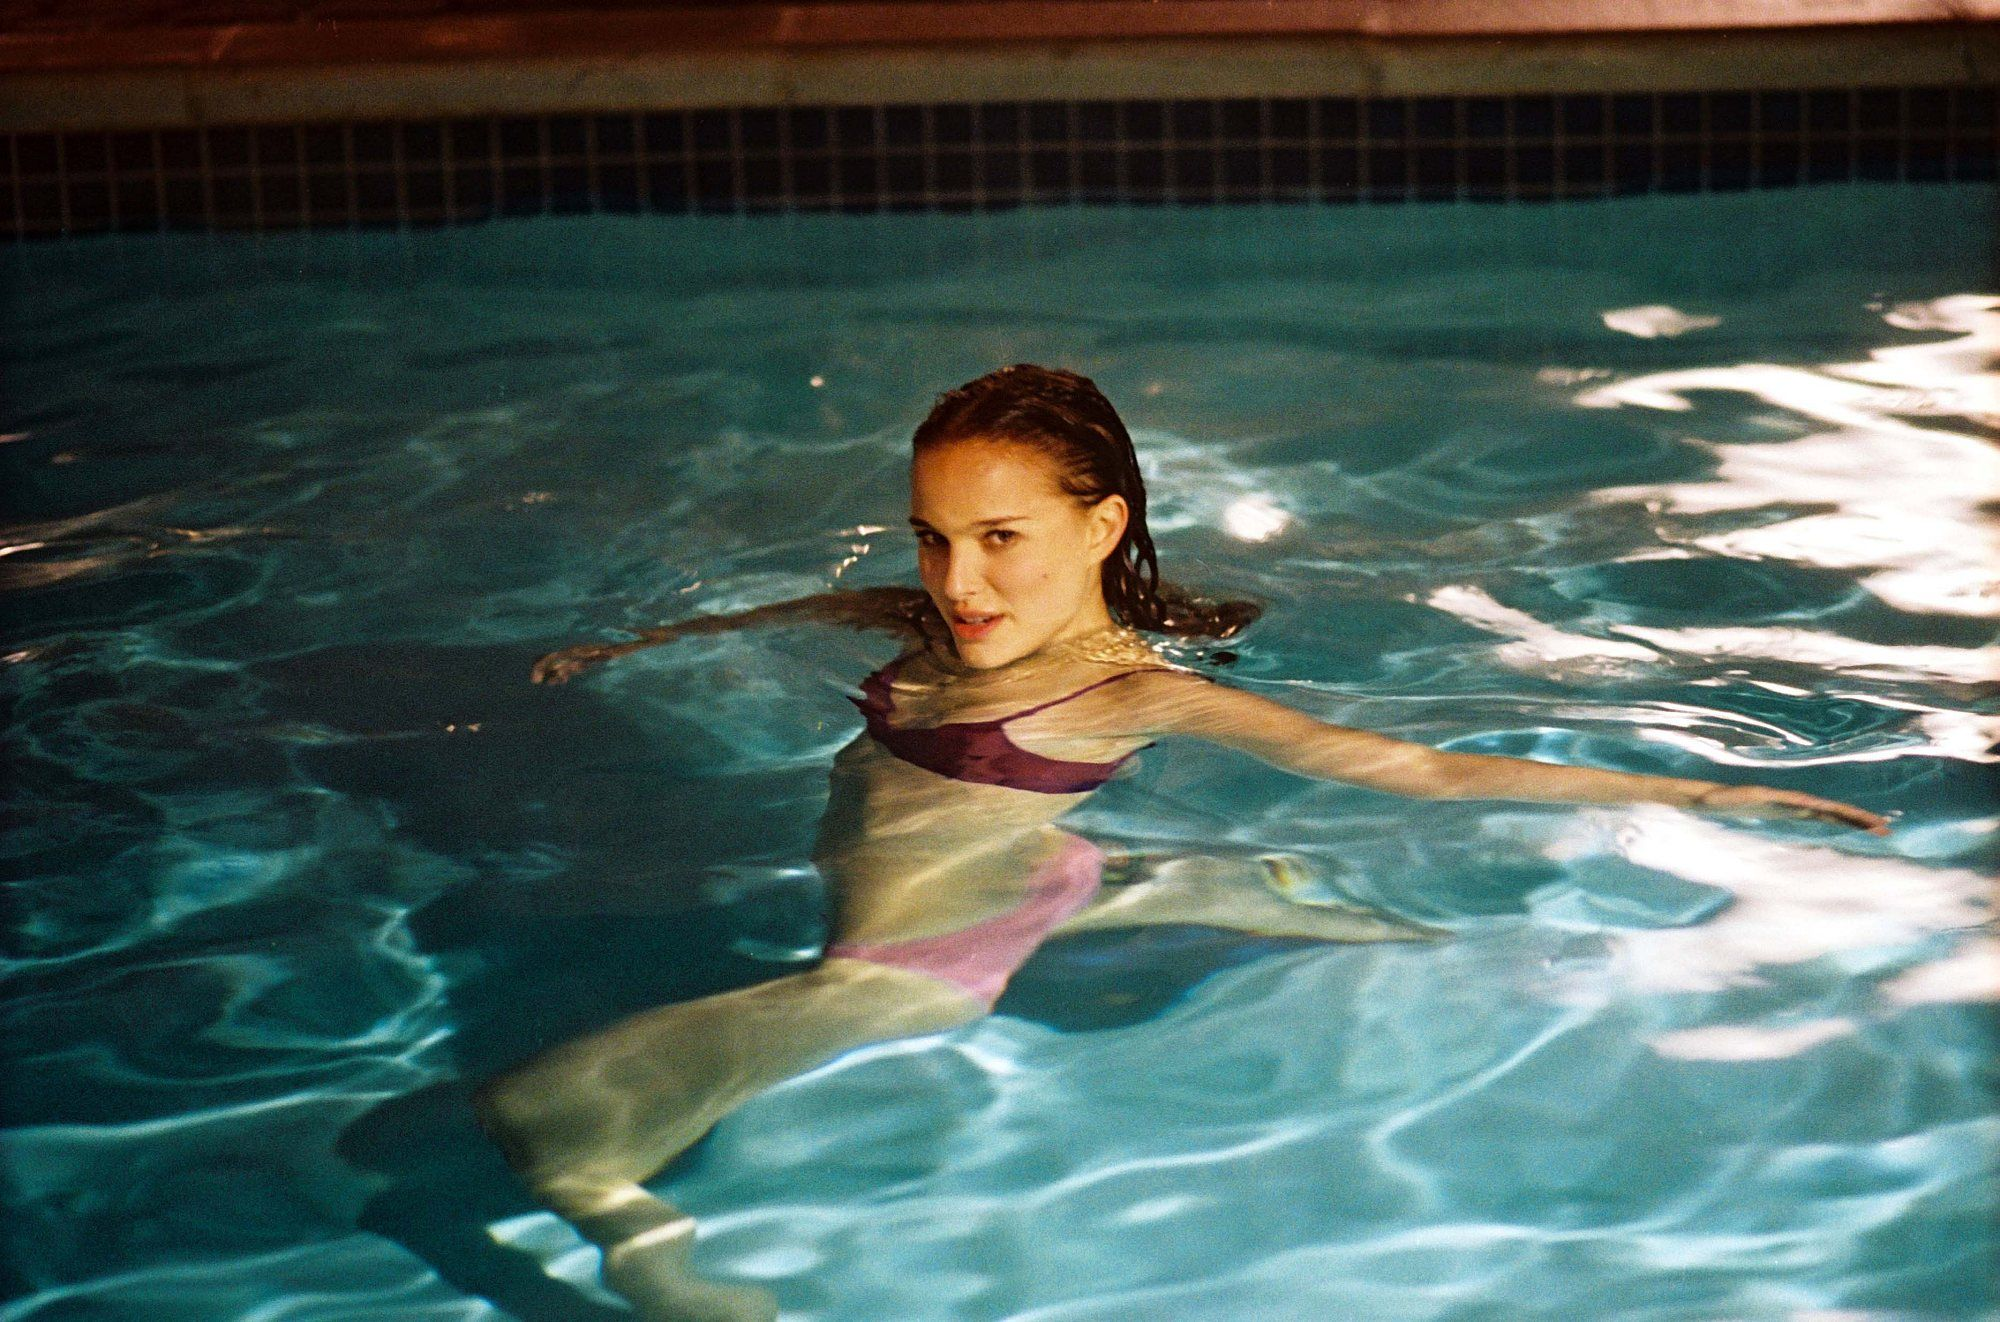 Natalie portman garden state bikini